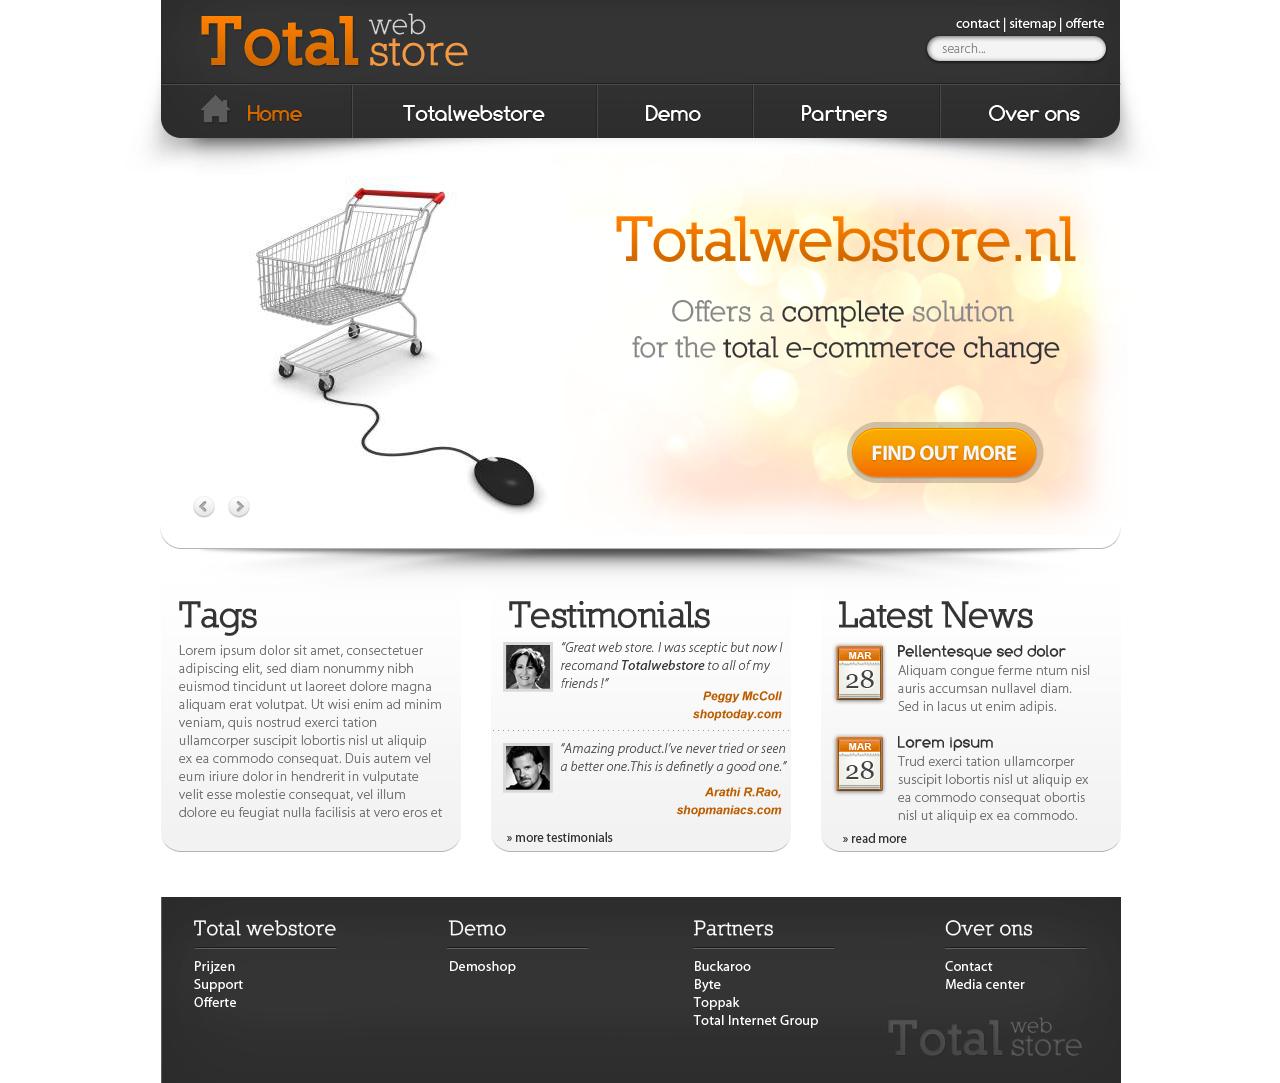 Totalwebstore needs a new website design